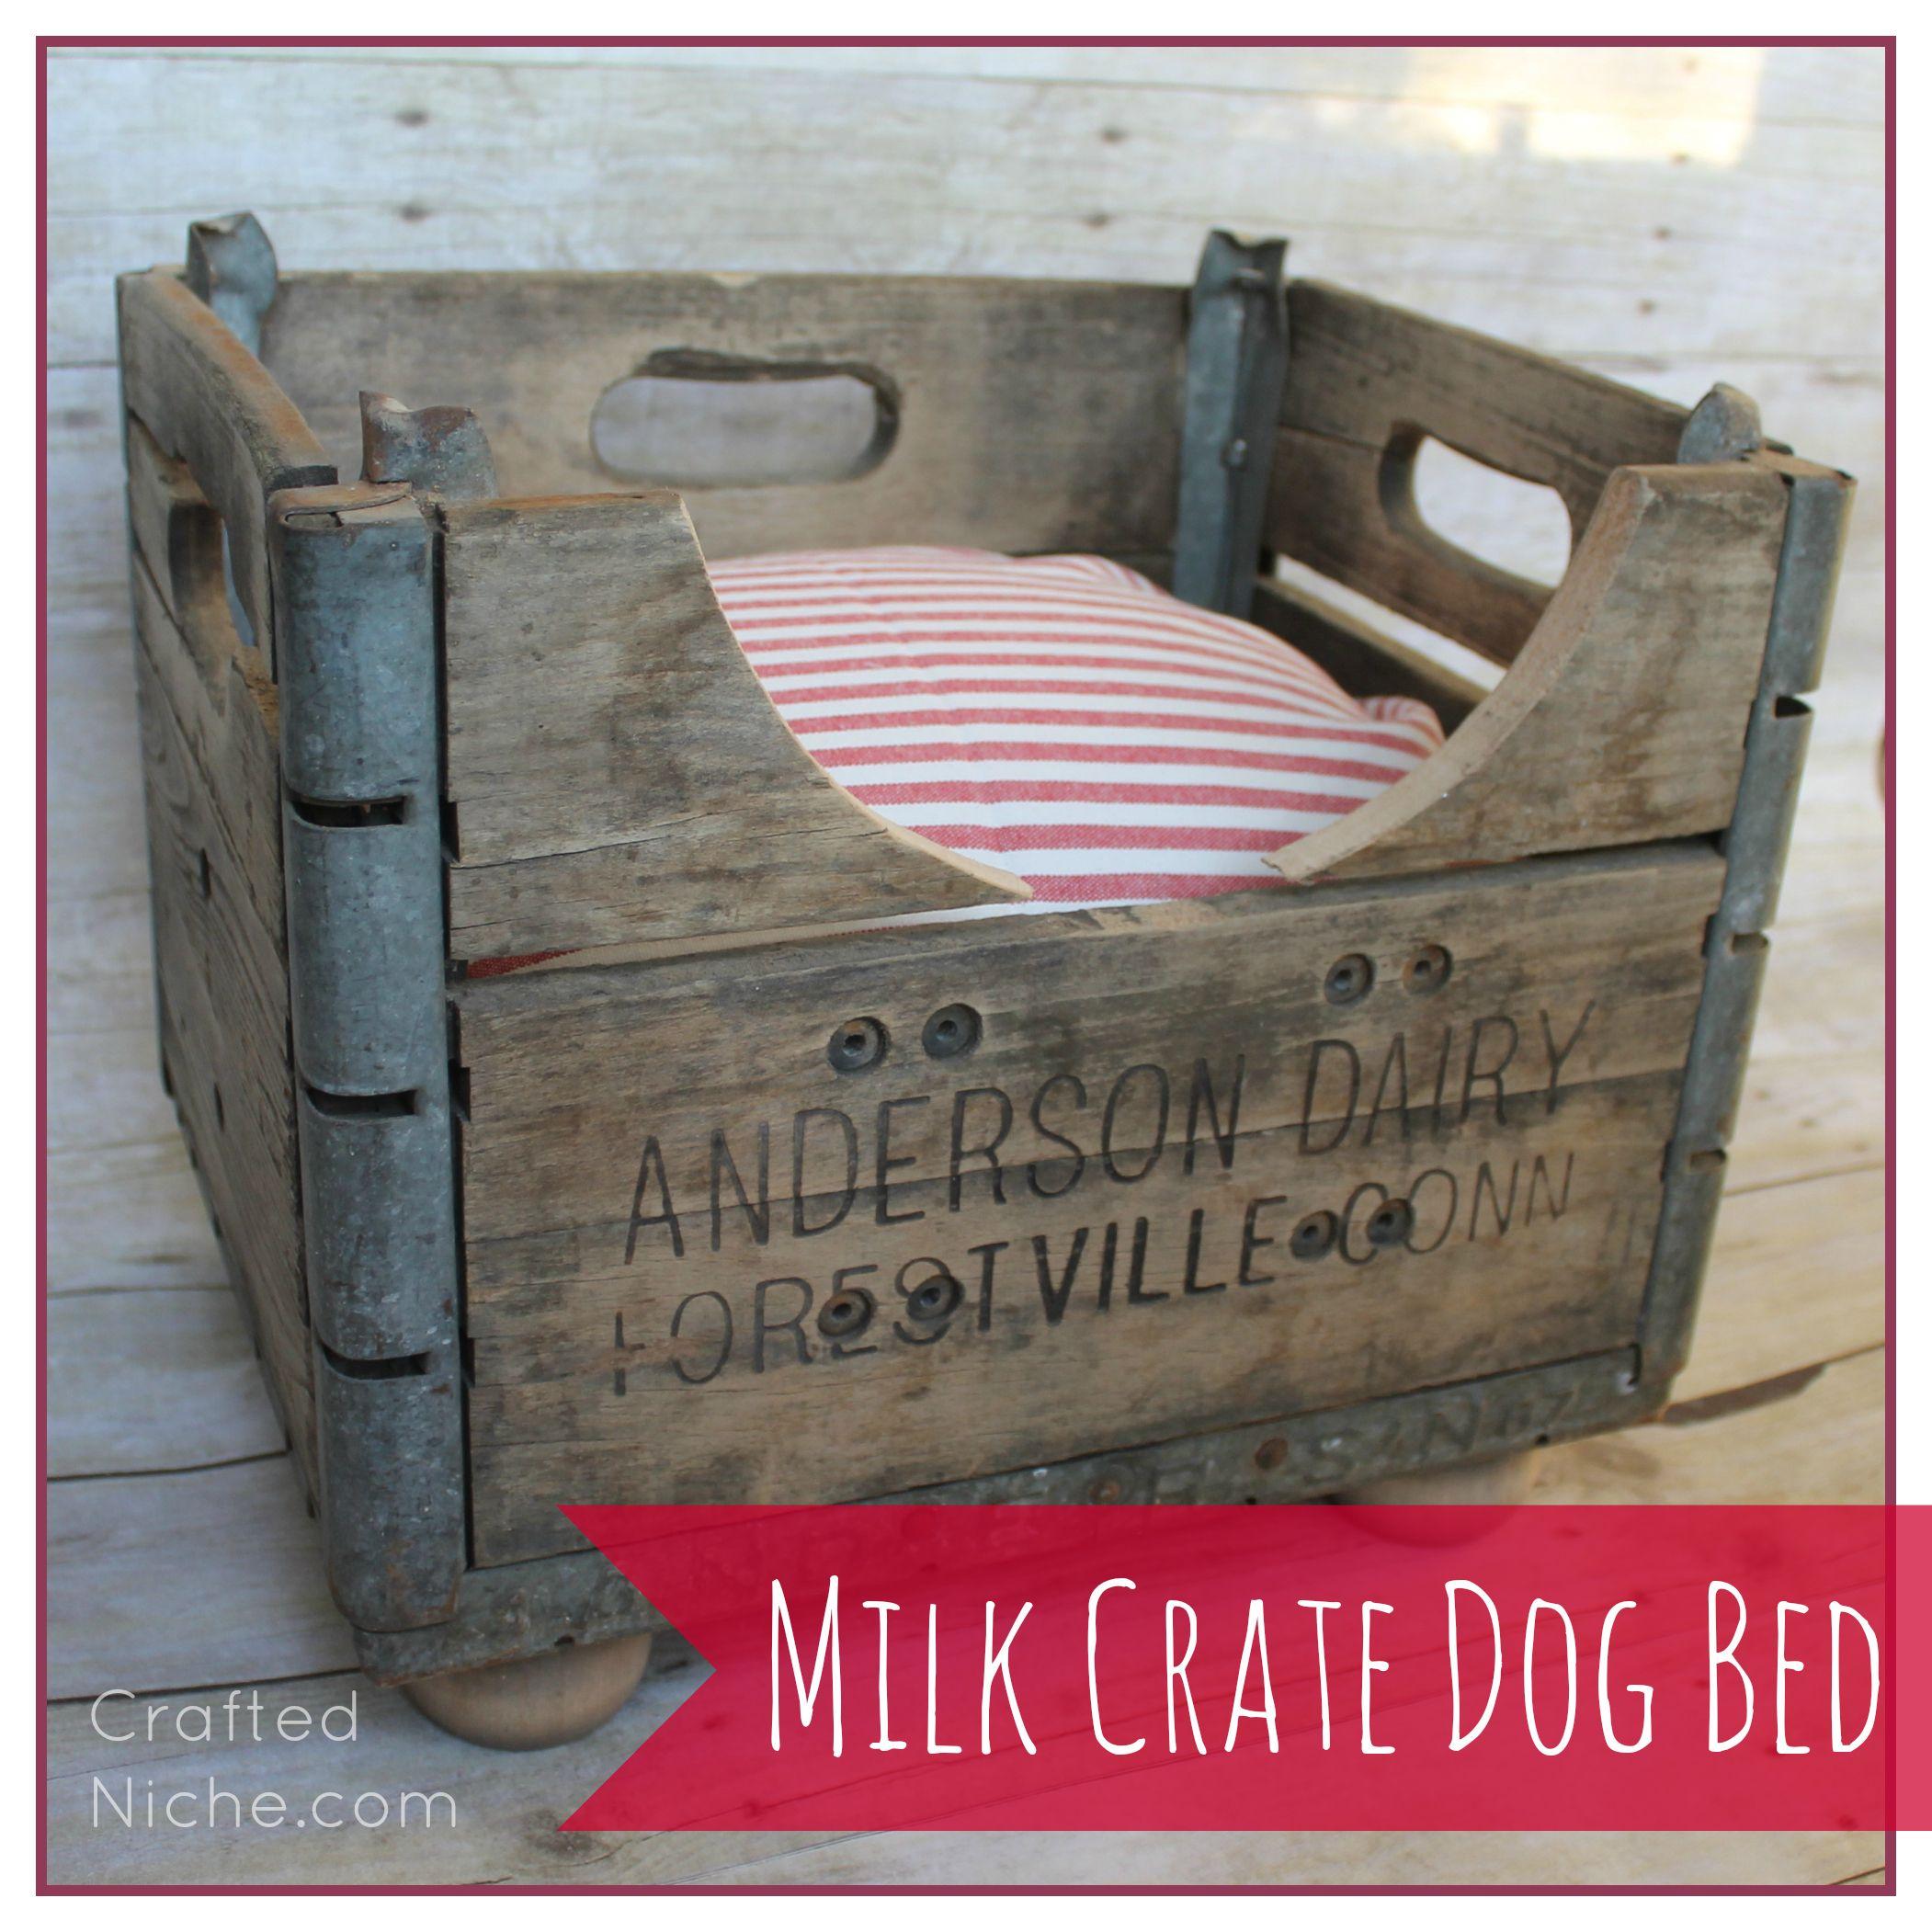 milk crate dog bed square